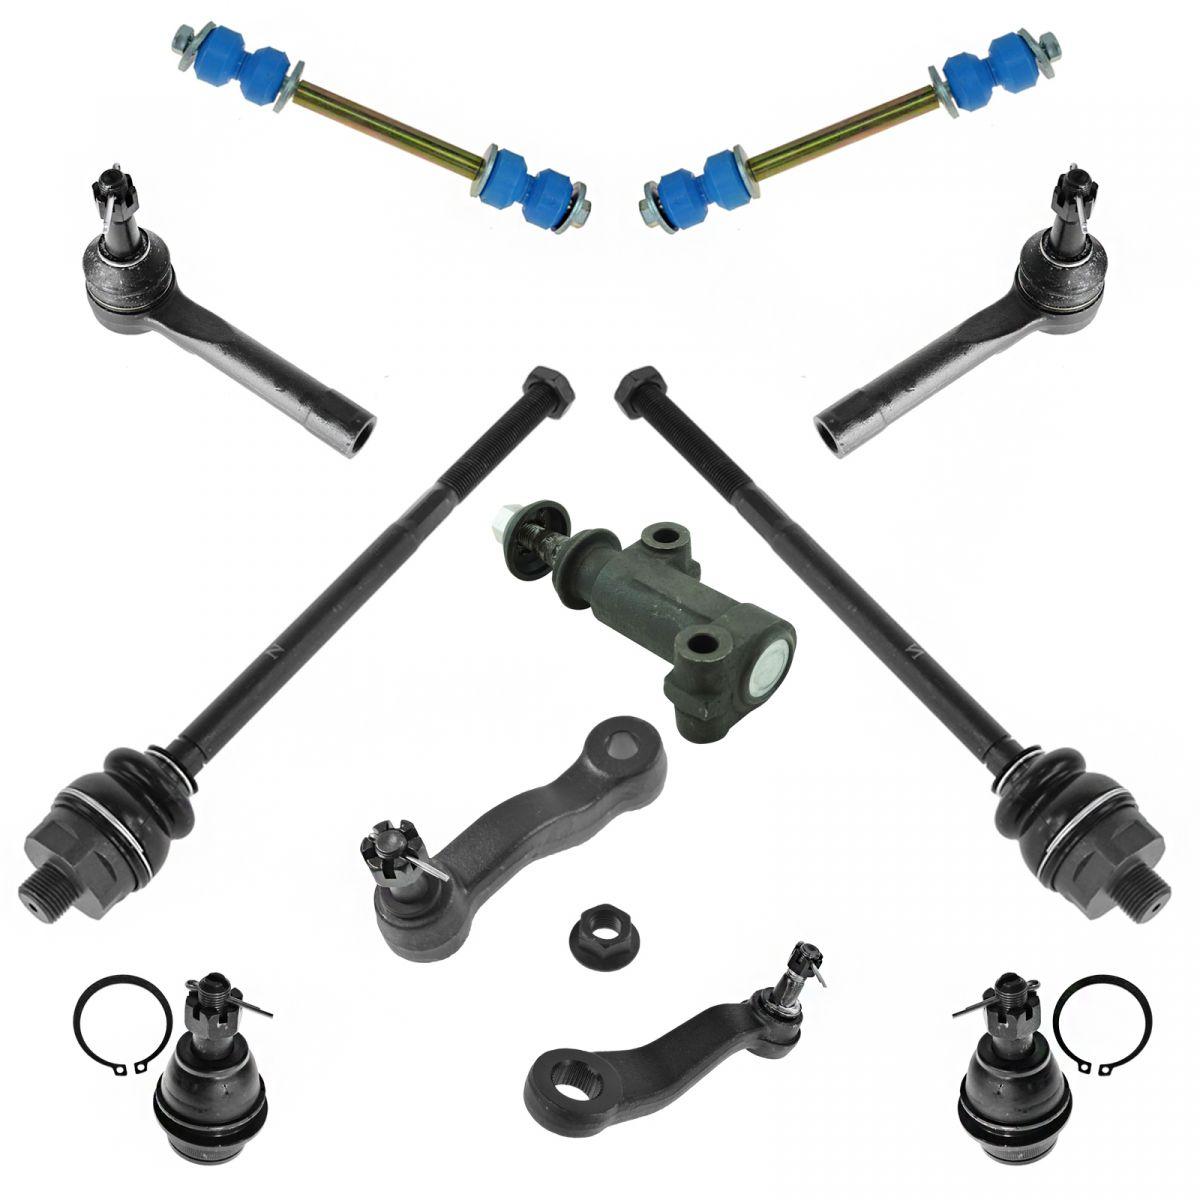 Tie Rod End Pitman /& Idler Arm Steering Kit Moog For Escalade Blazer Tahoe Yukon